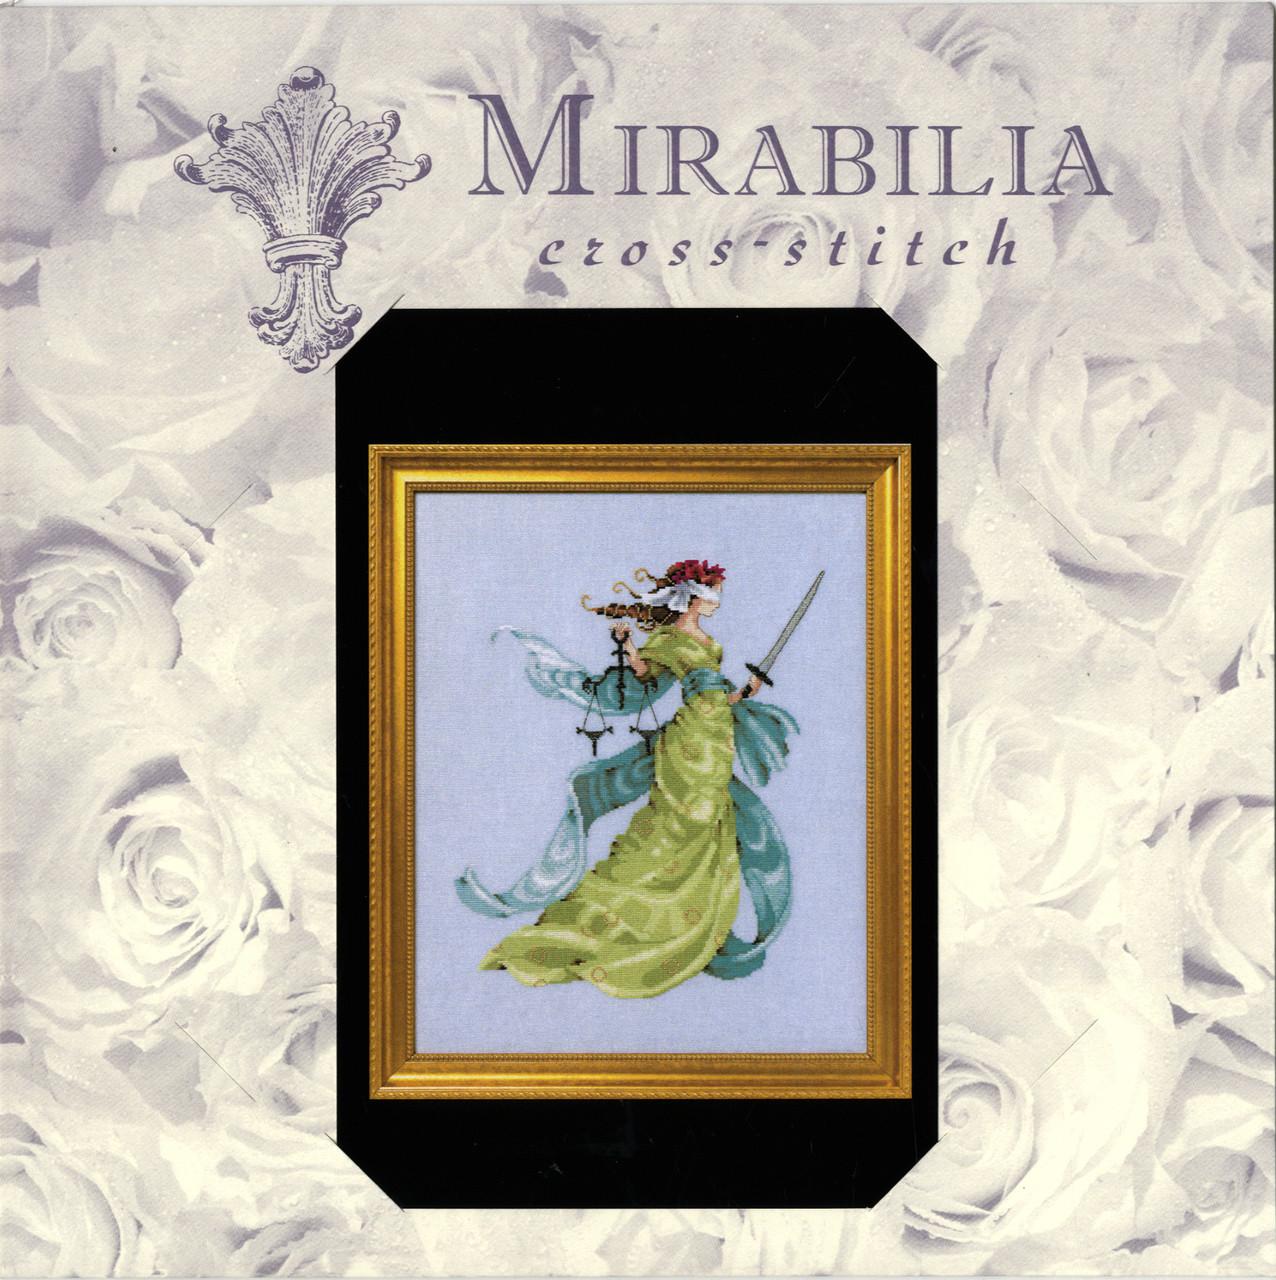 Mirabilia - Lady Justice